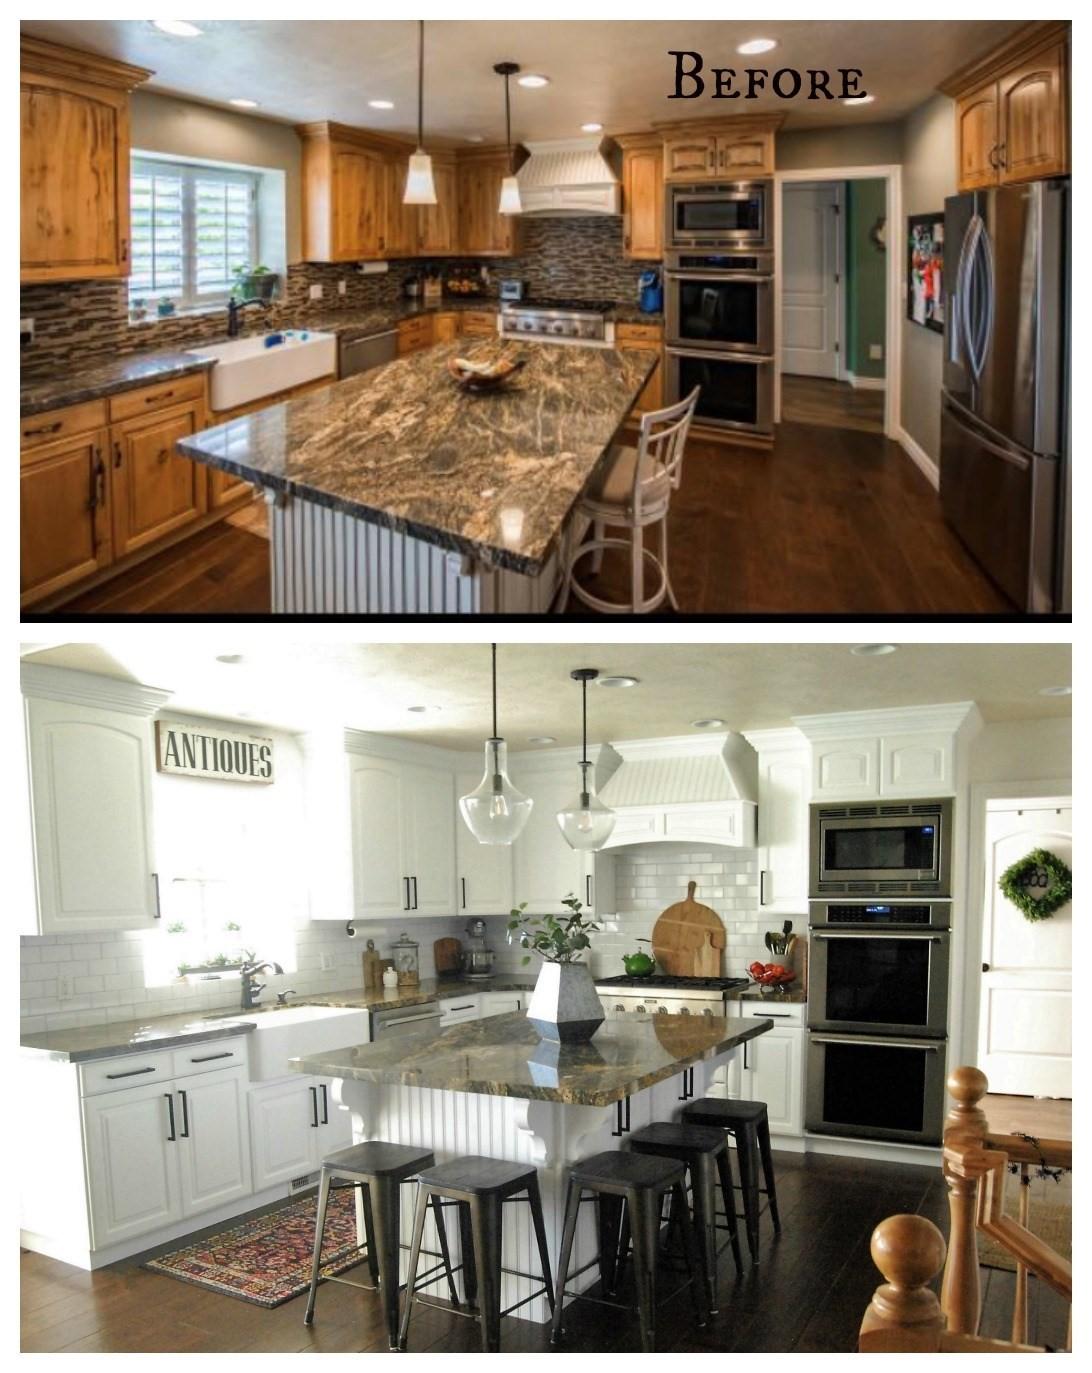 7 Reface the Kitchen Cabinets via simphome